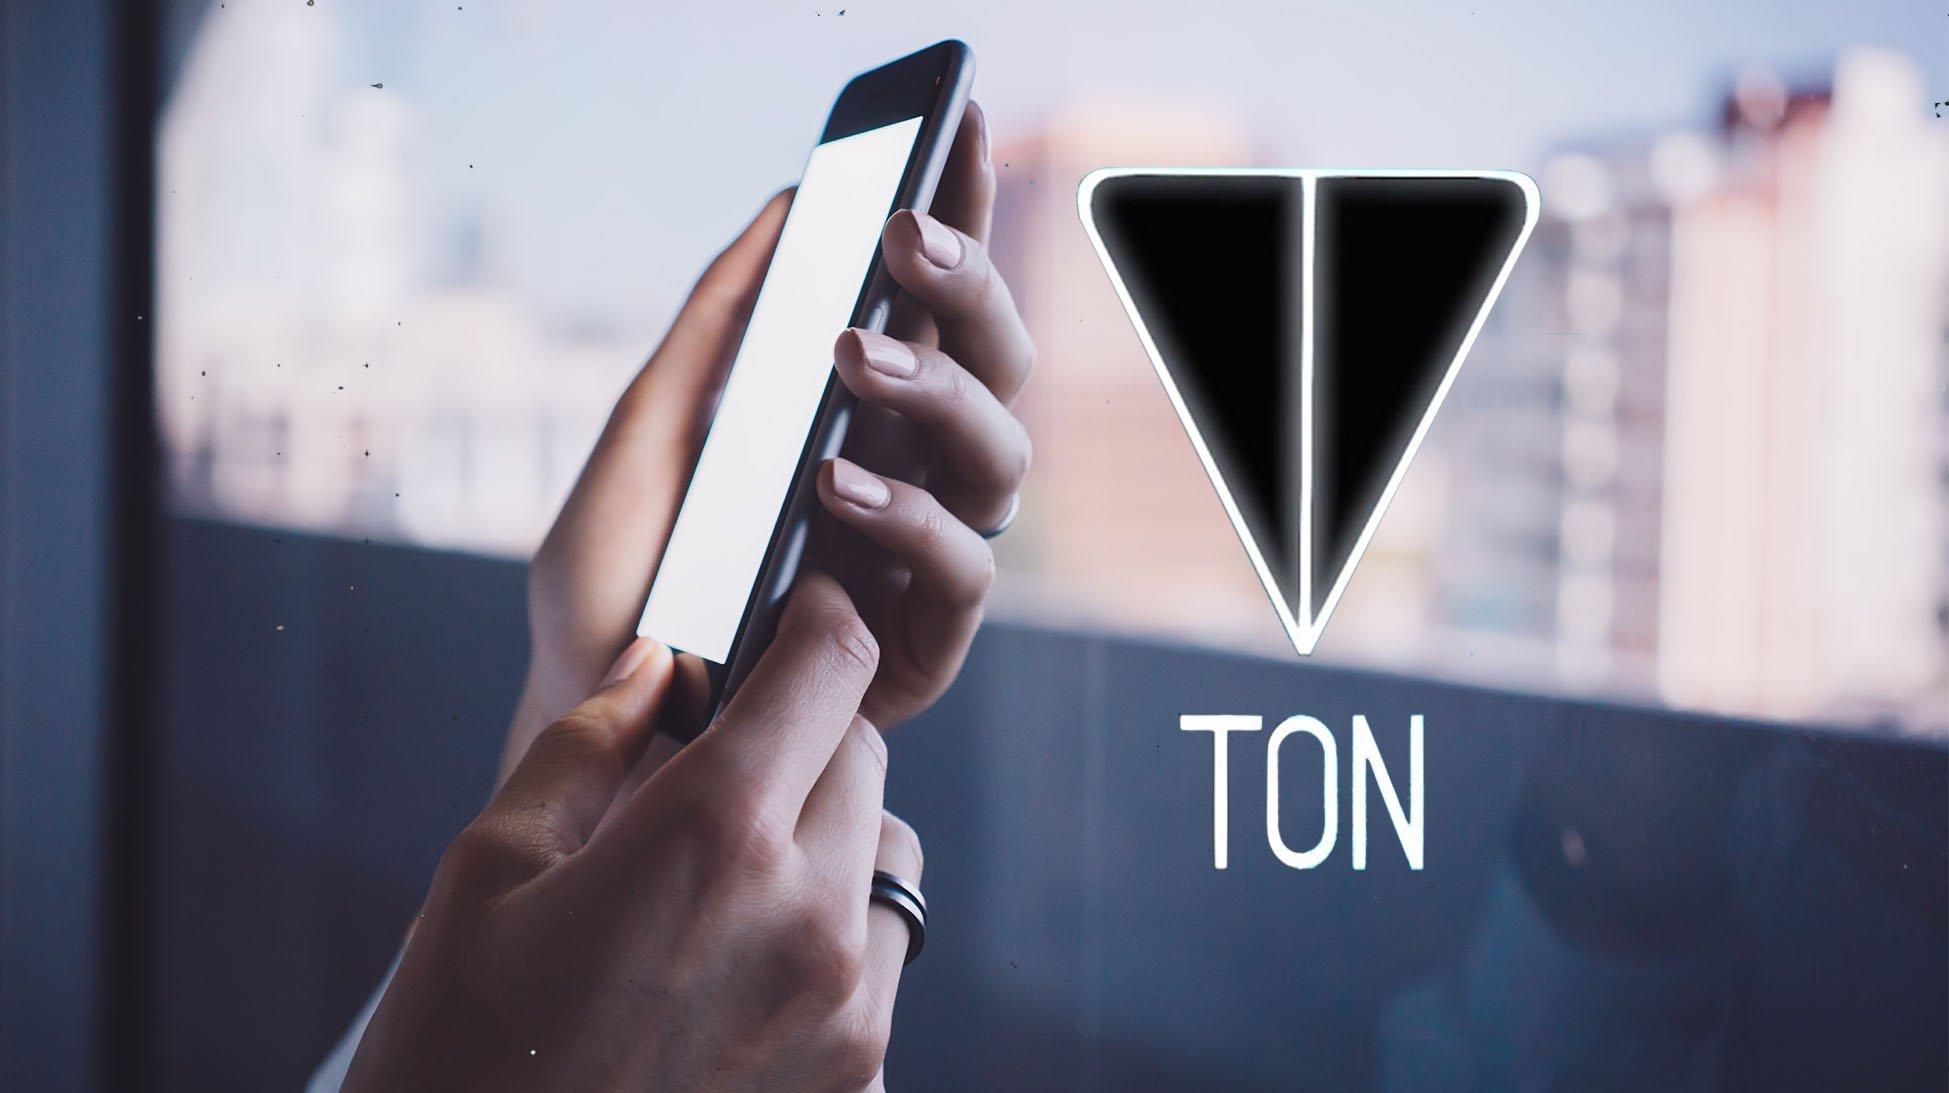 Telegram's Privacy-Focused User Base Could Become TON Blockchain's Killer App